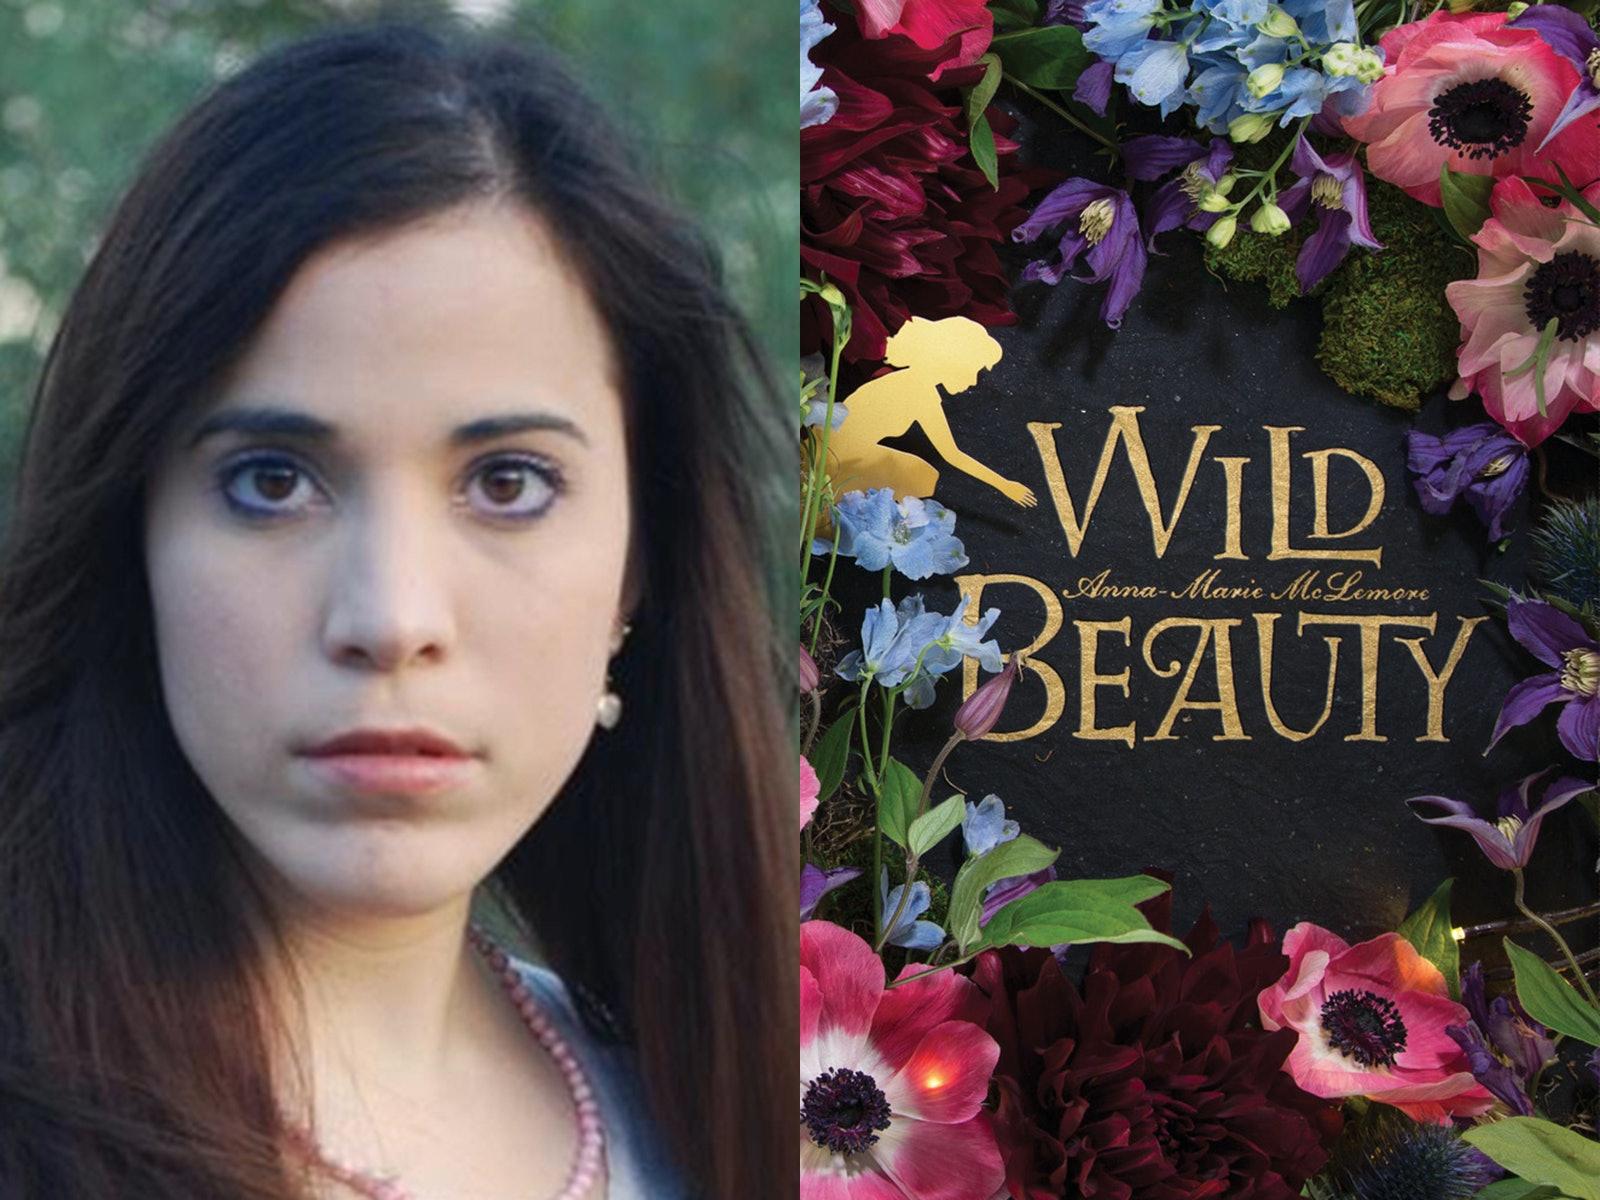 wild beauty quotes